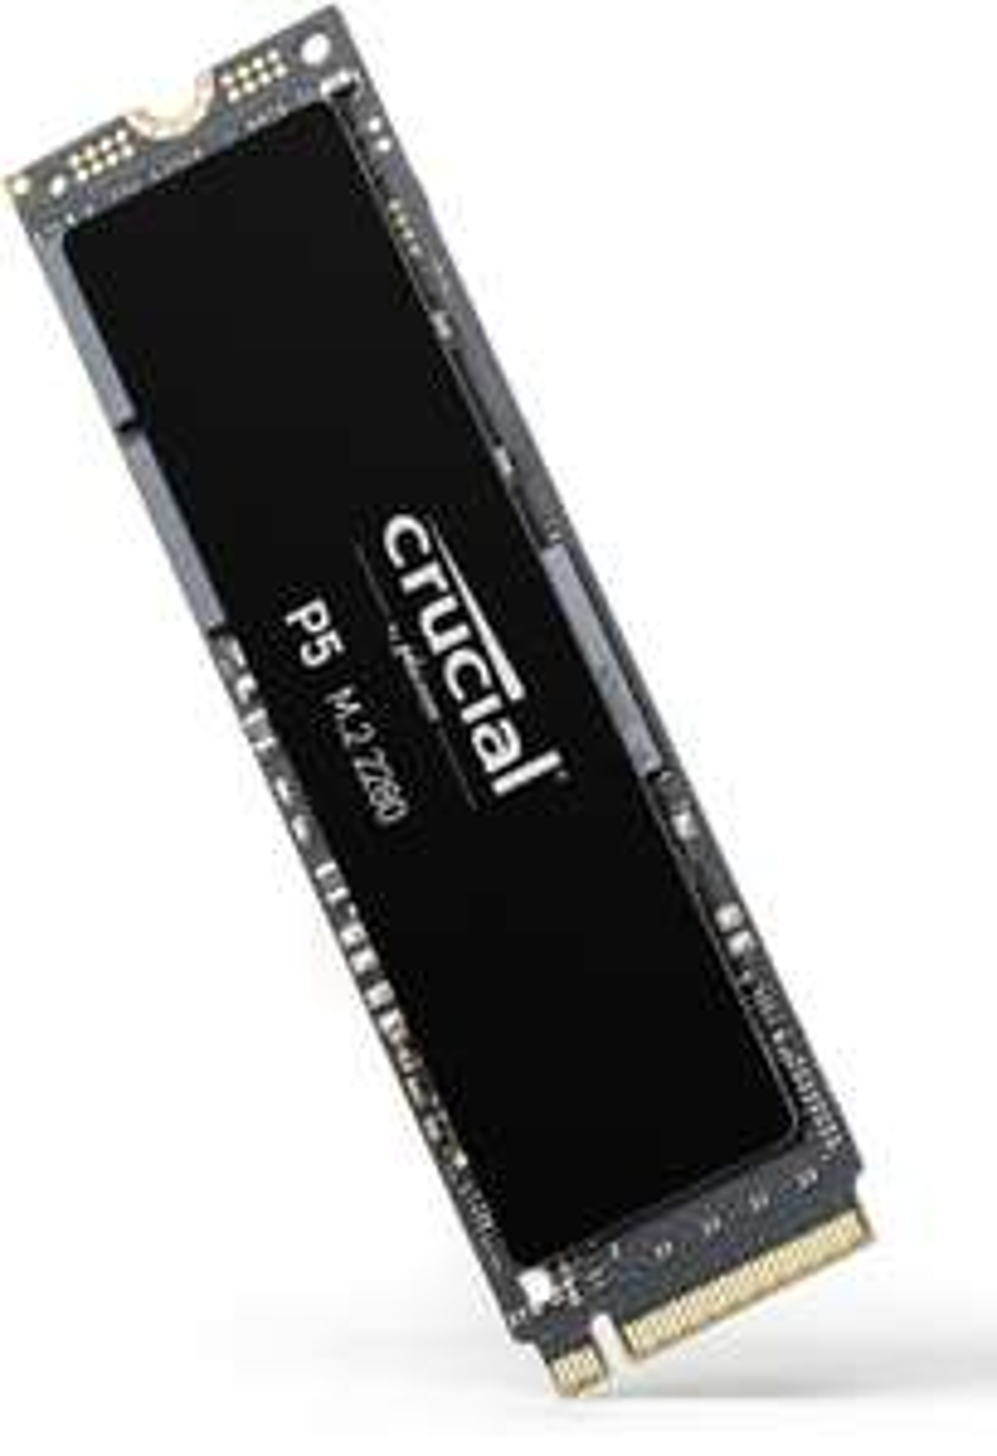 Crucial P5 500GB SSD + 1 Monat Xbox Game Pass PC für 49,97€